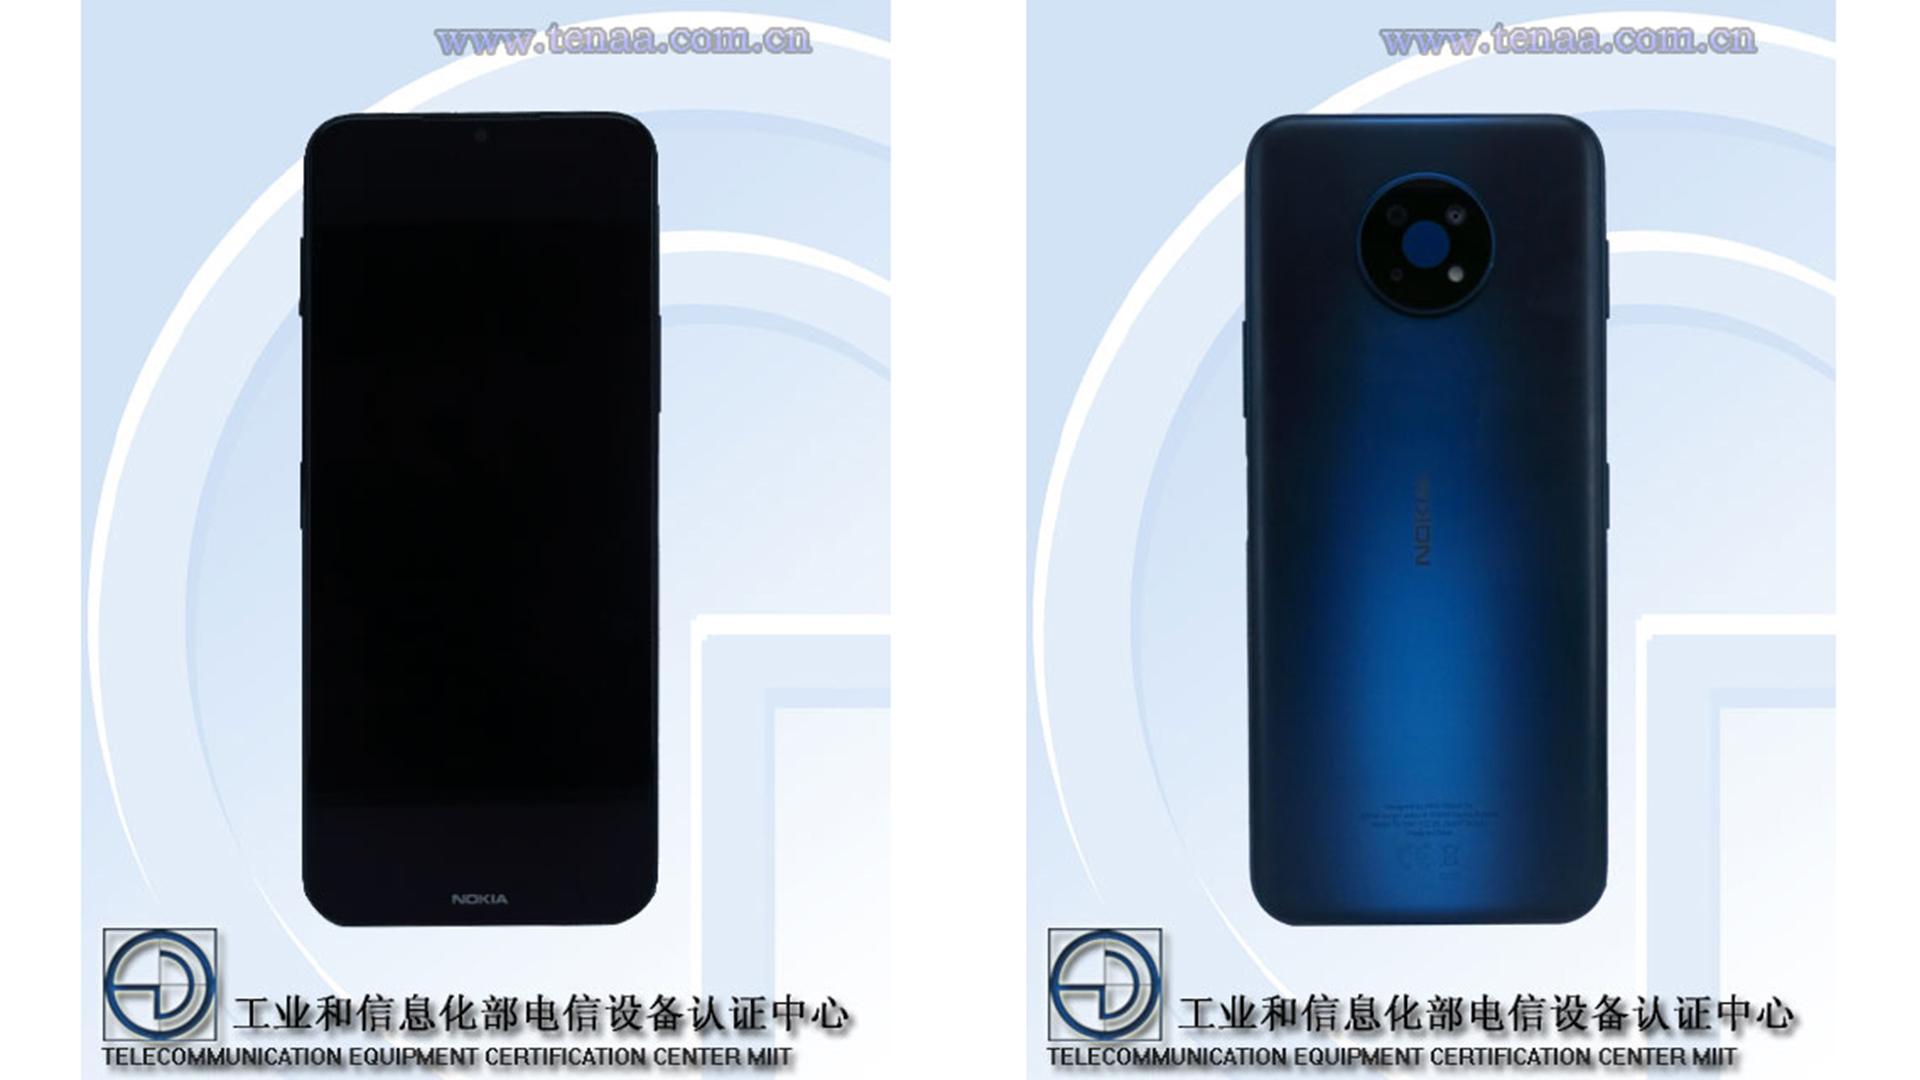 Nokia G50 TENAA listing